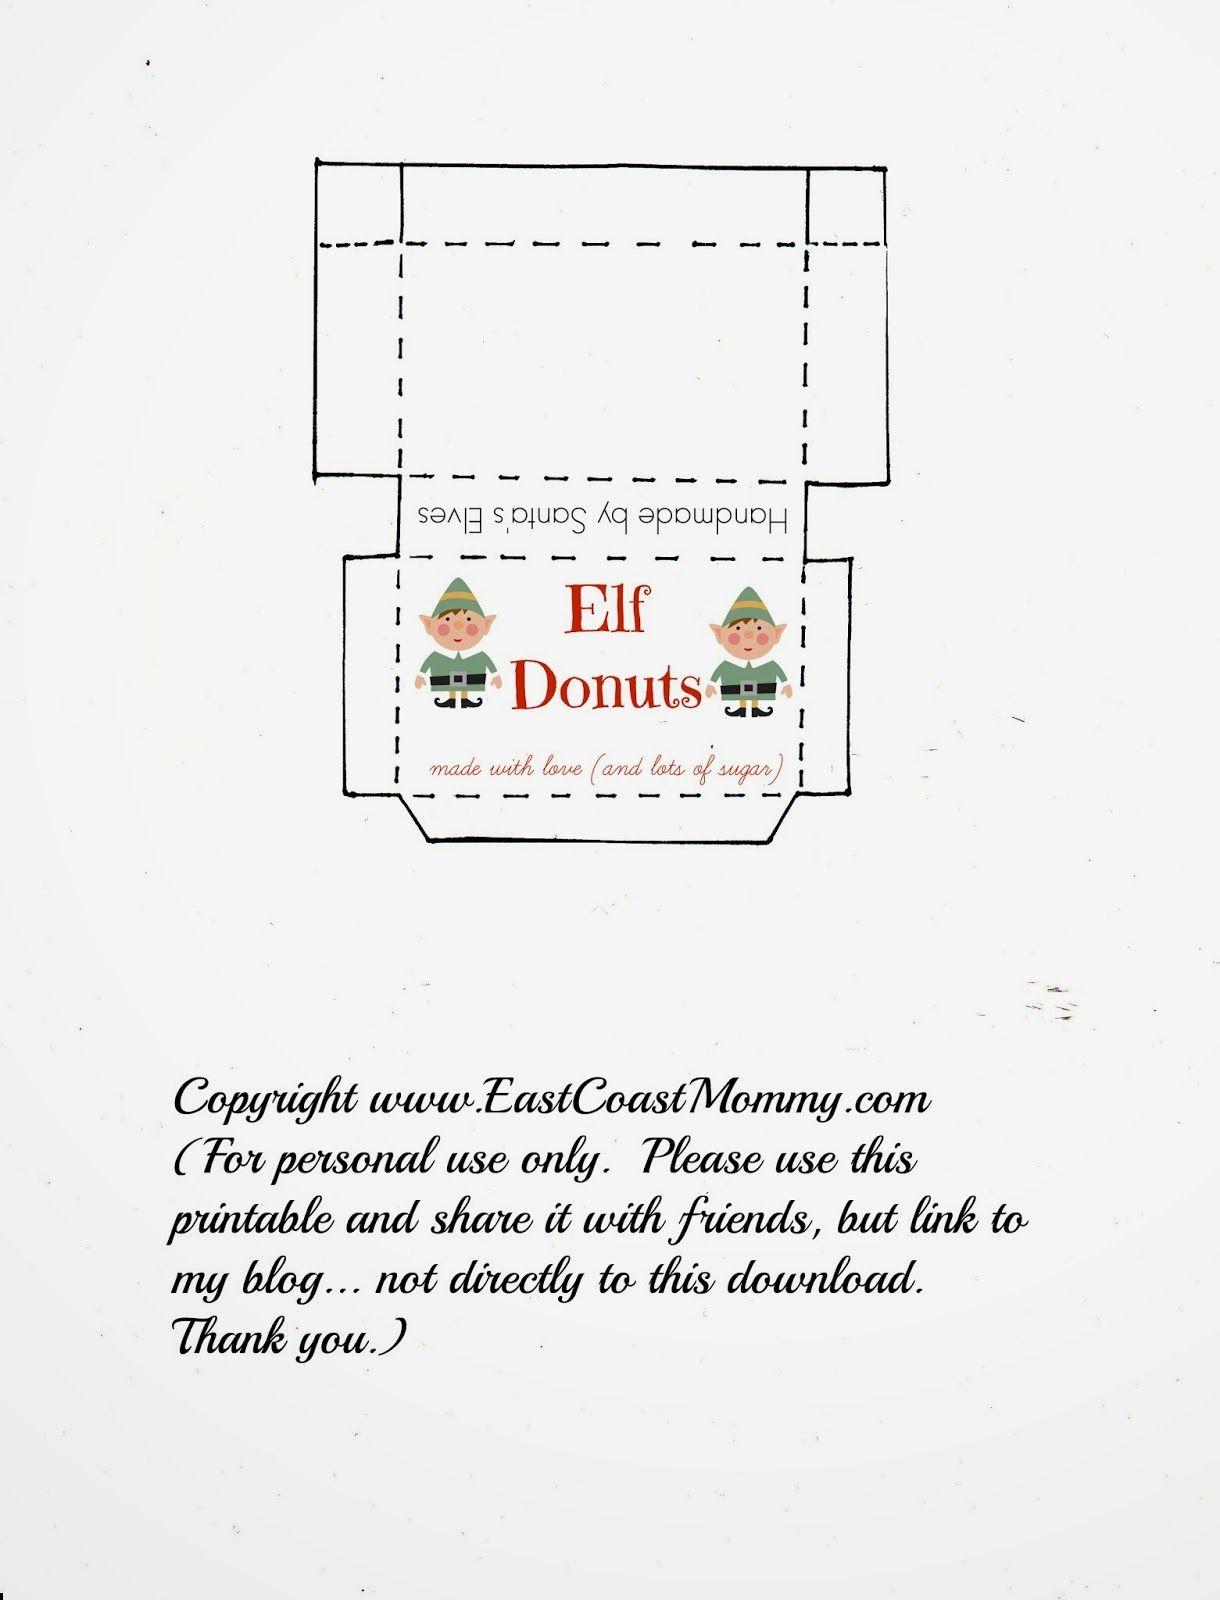 Elf On The Shelf Donuts Free Printable Box Elf On The Self Elf On The Shelf Awesome Elf On The Shelf Ideas